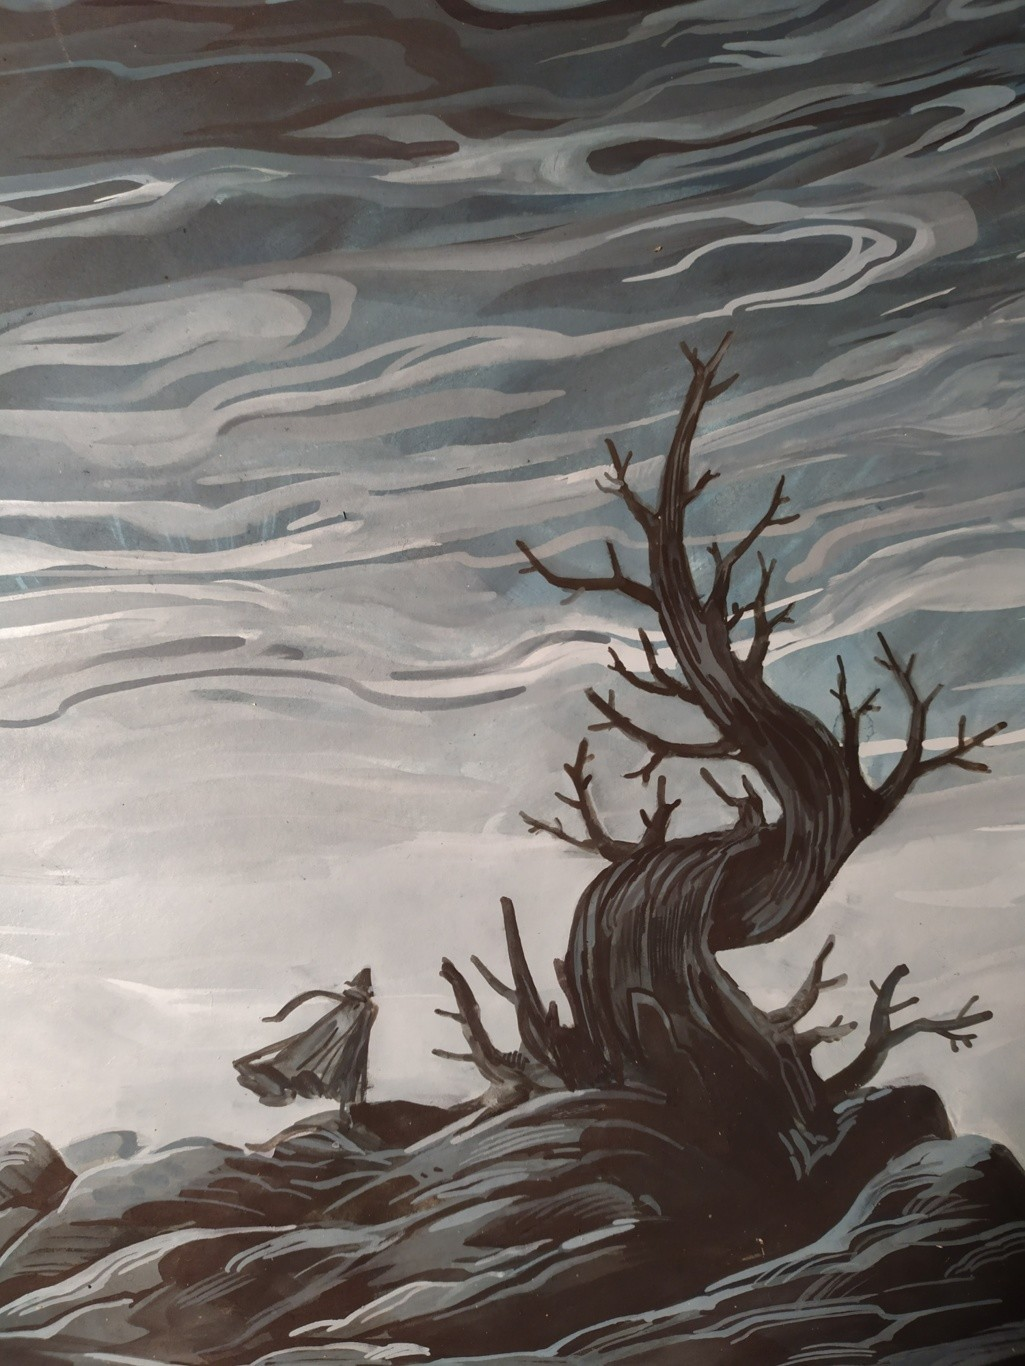 Peinture de perso au pied d'un arbre mort